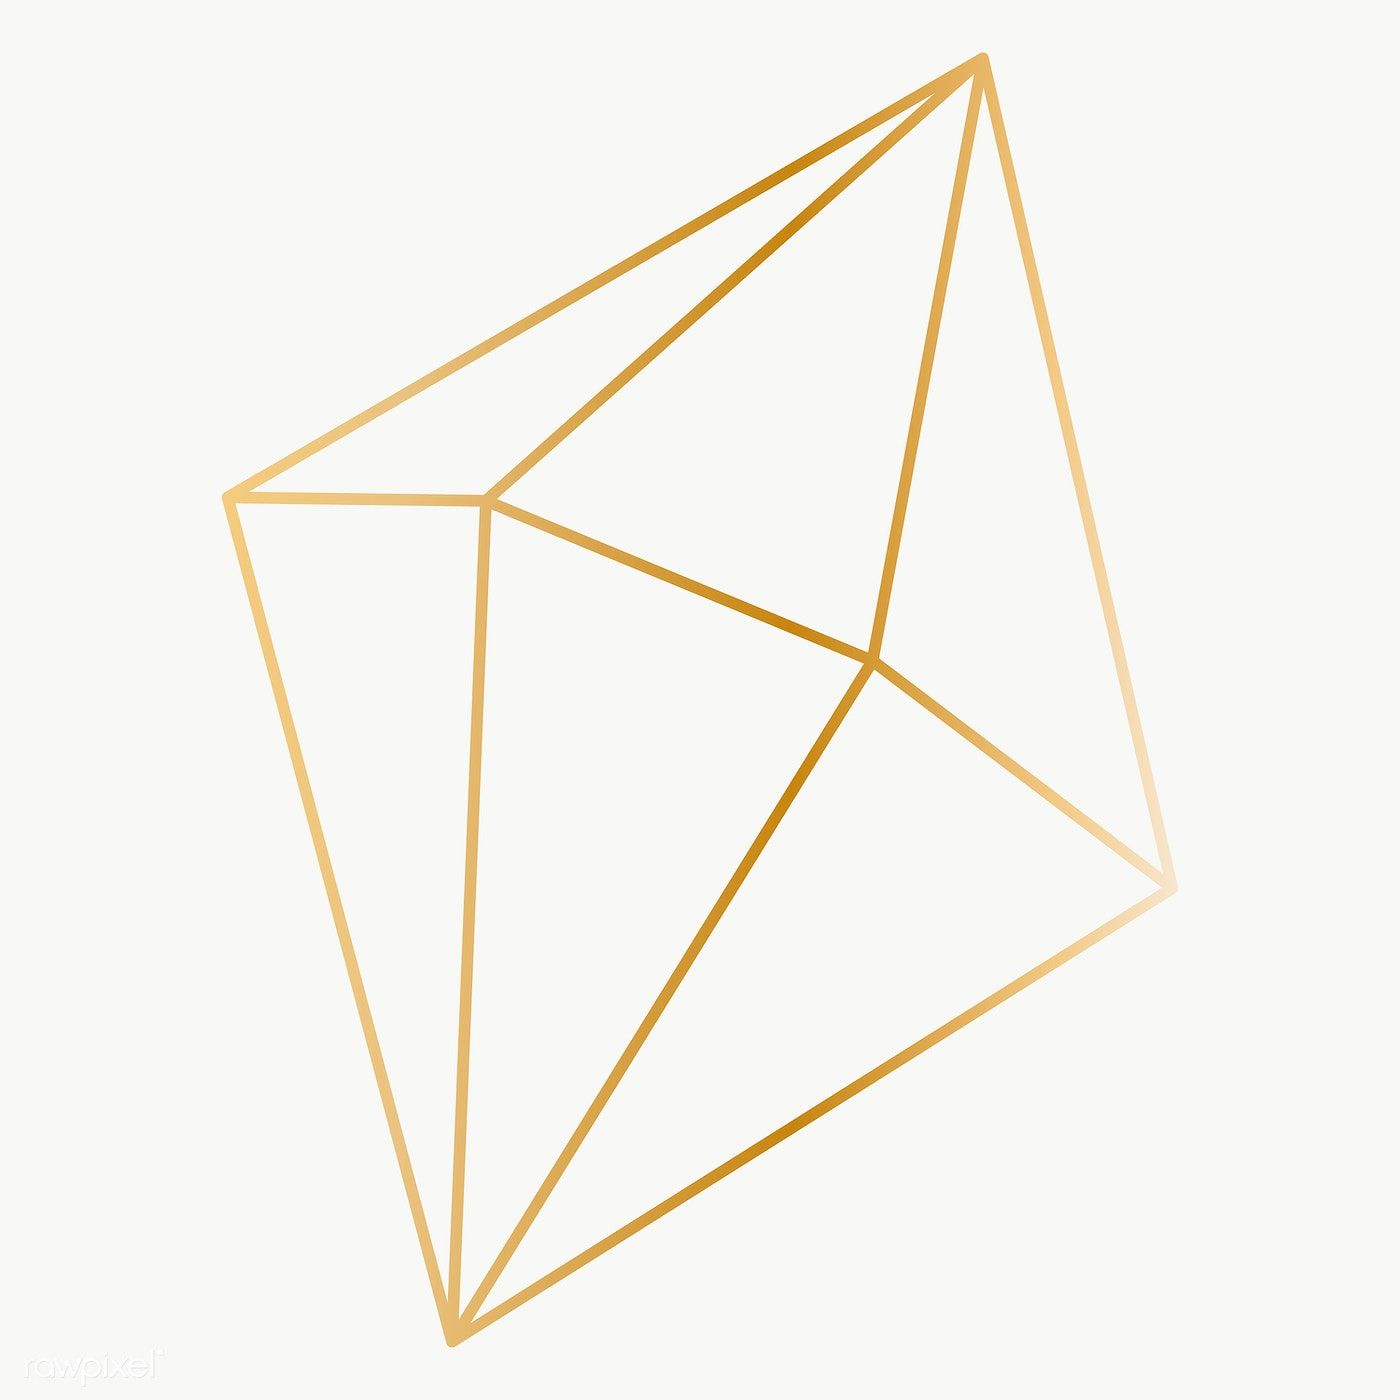 Minimal Gold Prism Shape Transparent Png Free Image By Rawpixel Com Katie Vector Background Pattern Geometric Diamond Prism Pattern